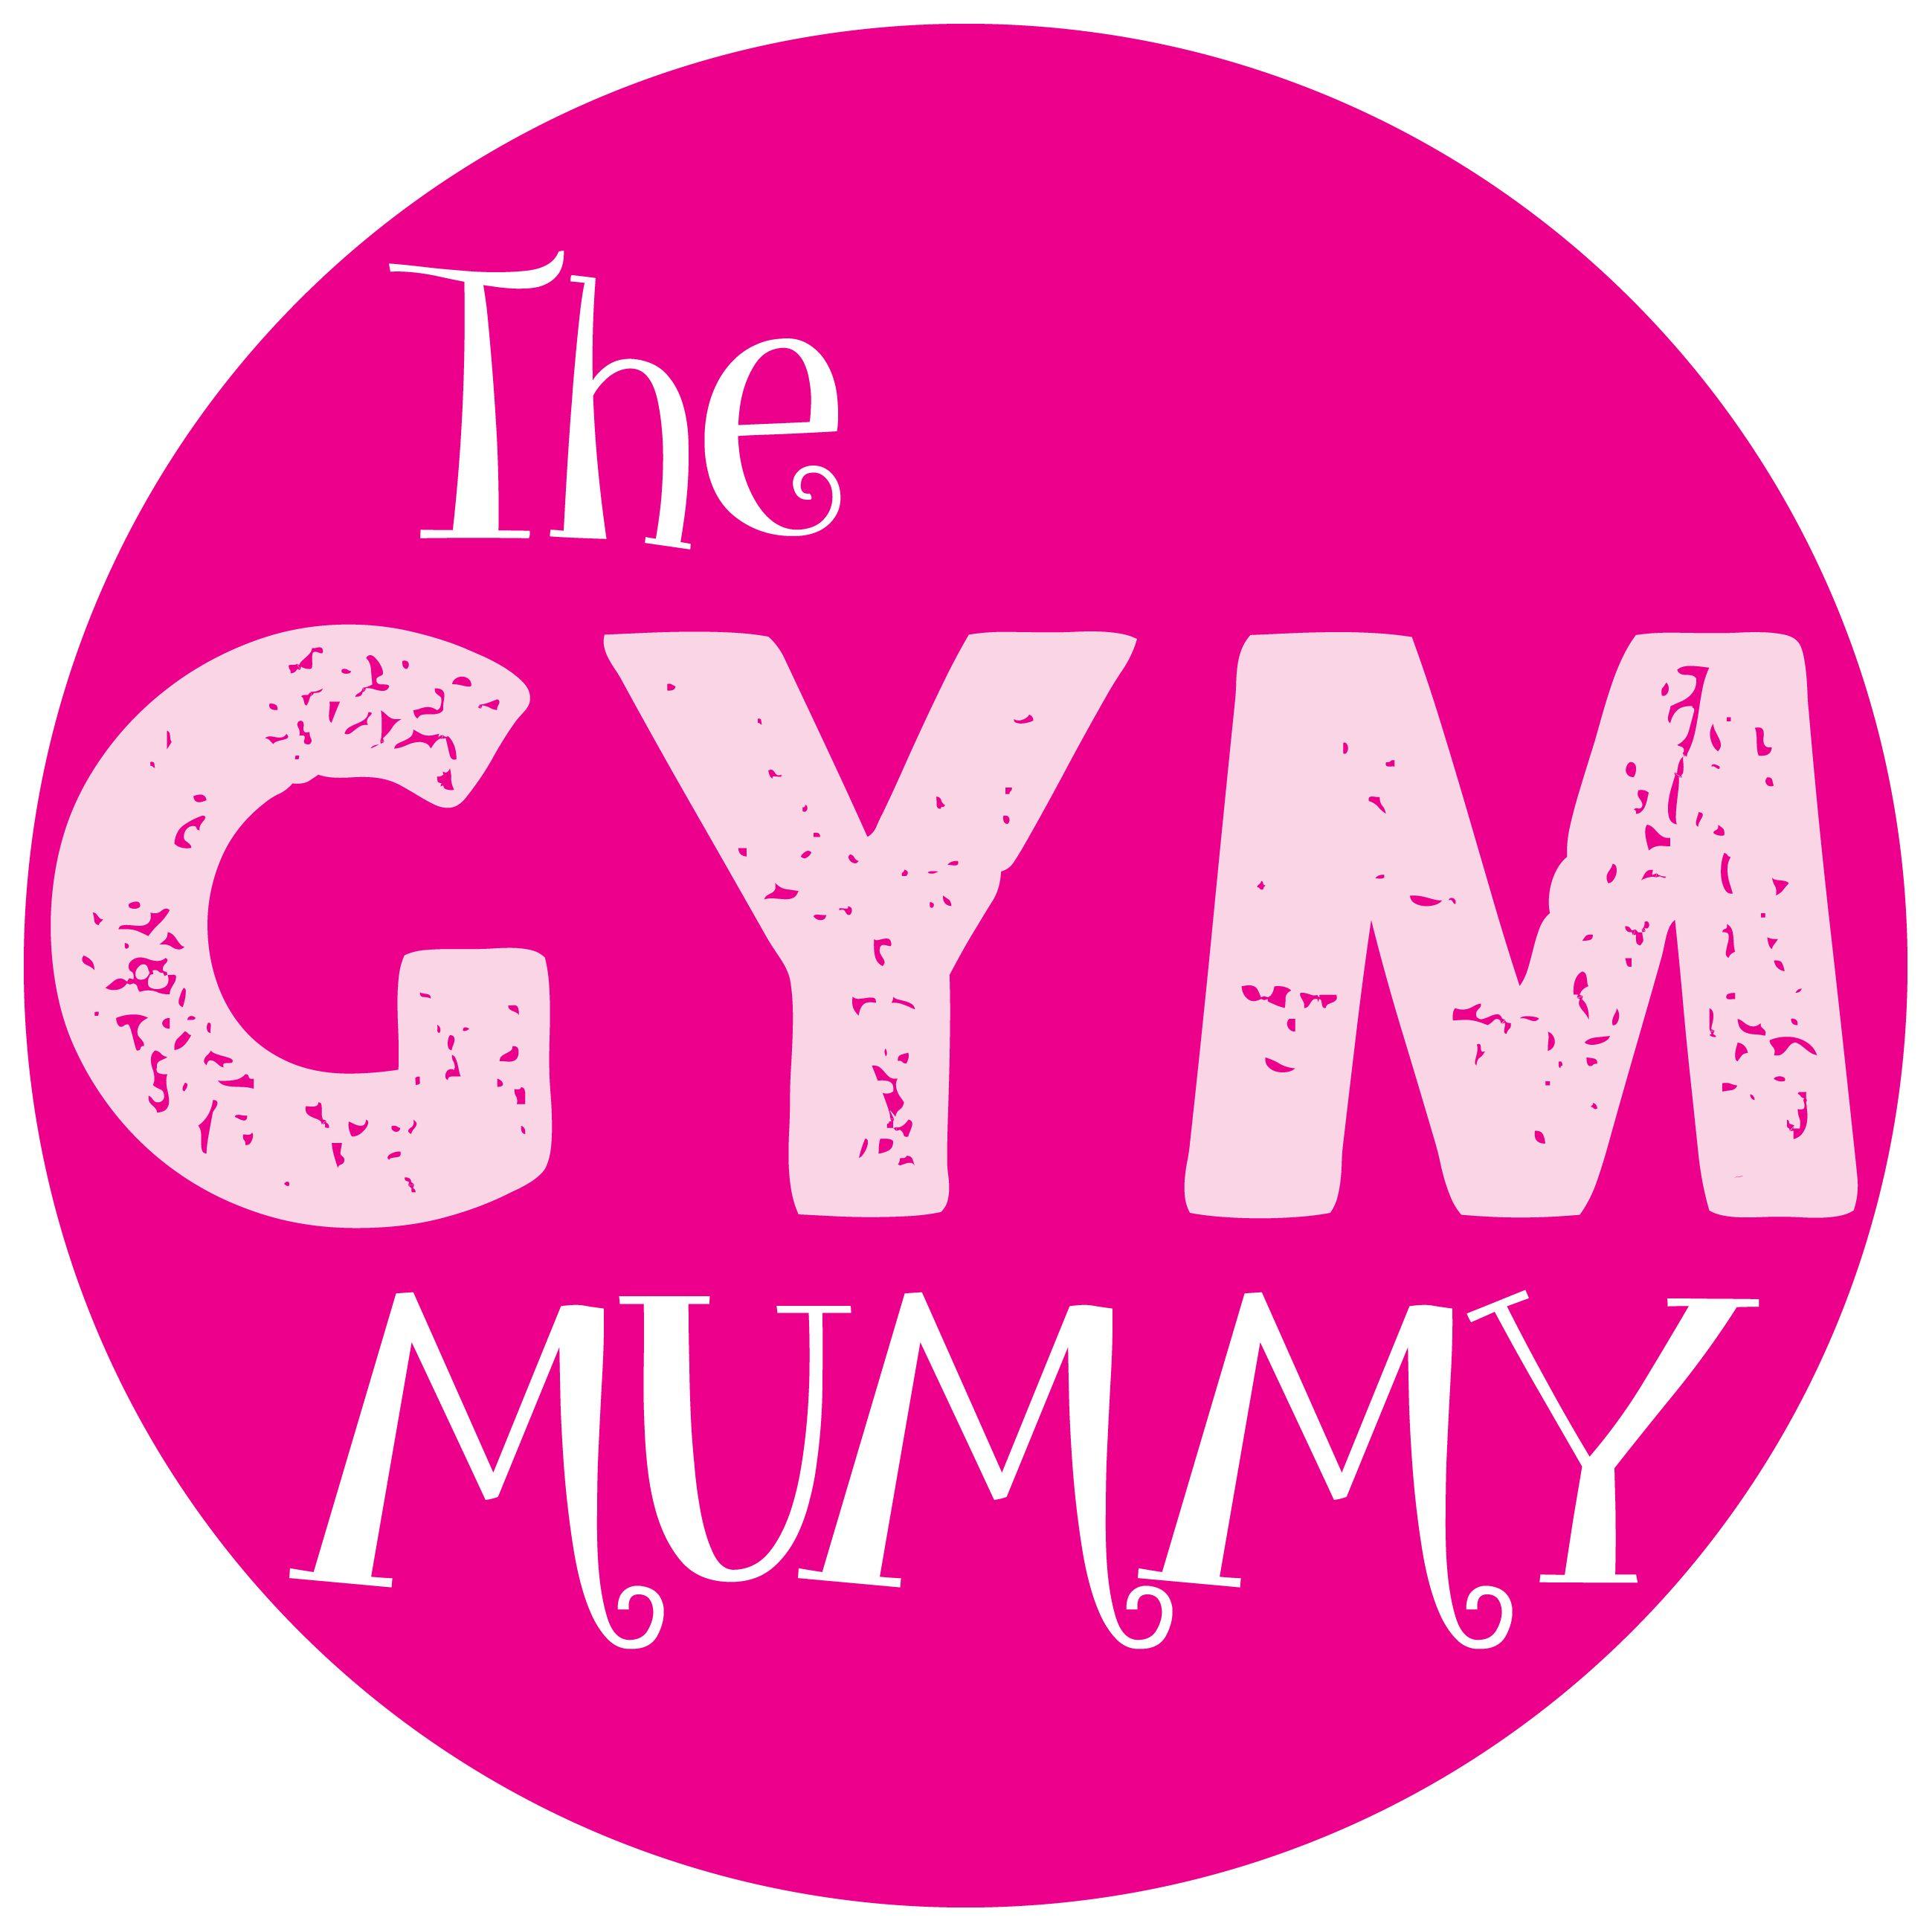 The Gym Mummy